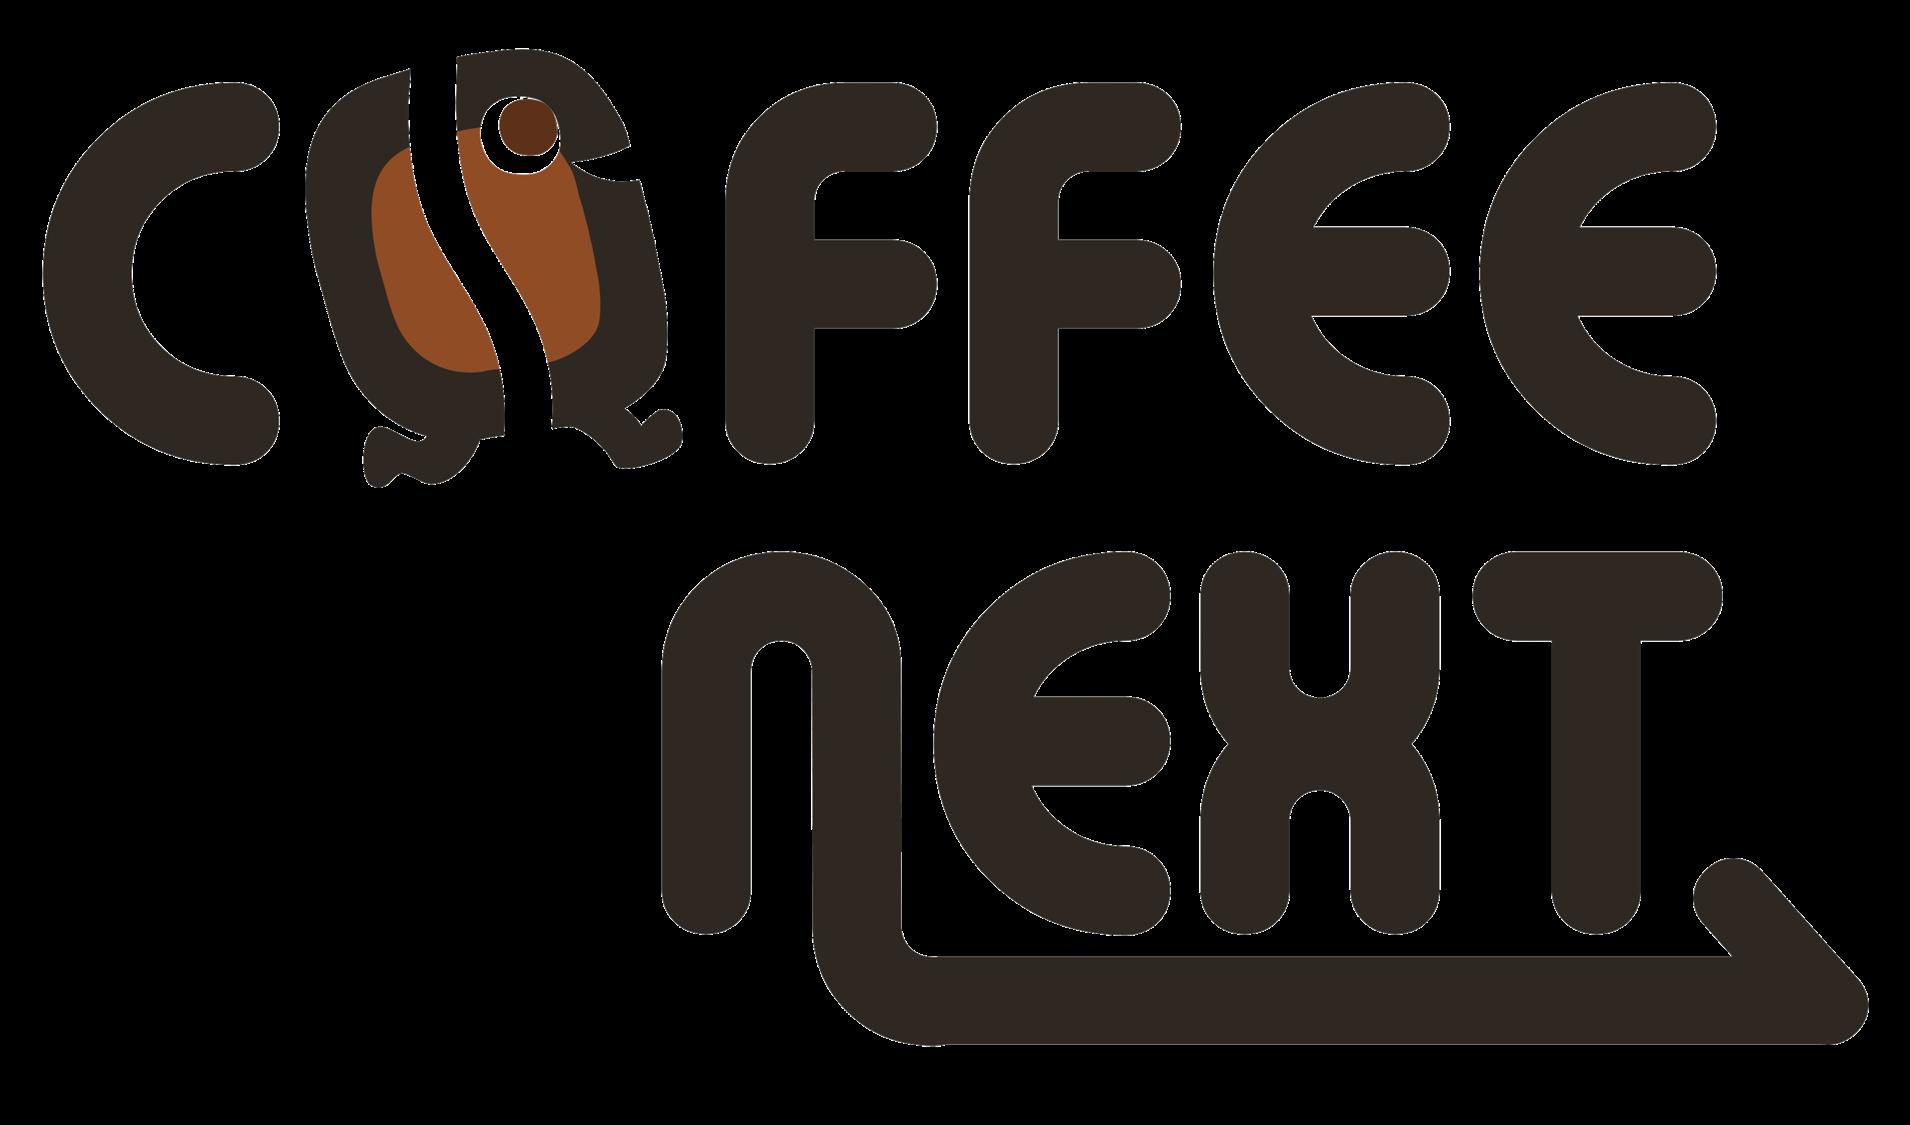 Coffee NEXT